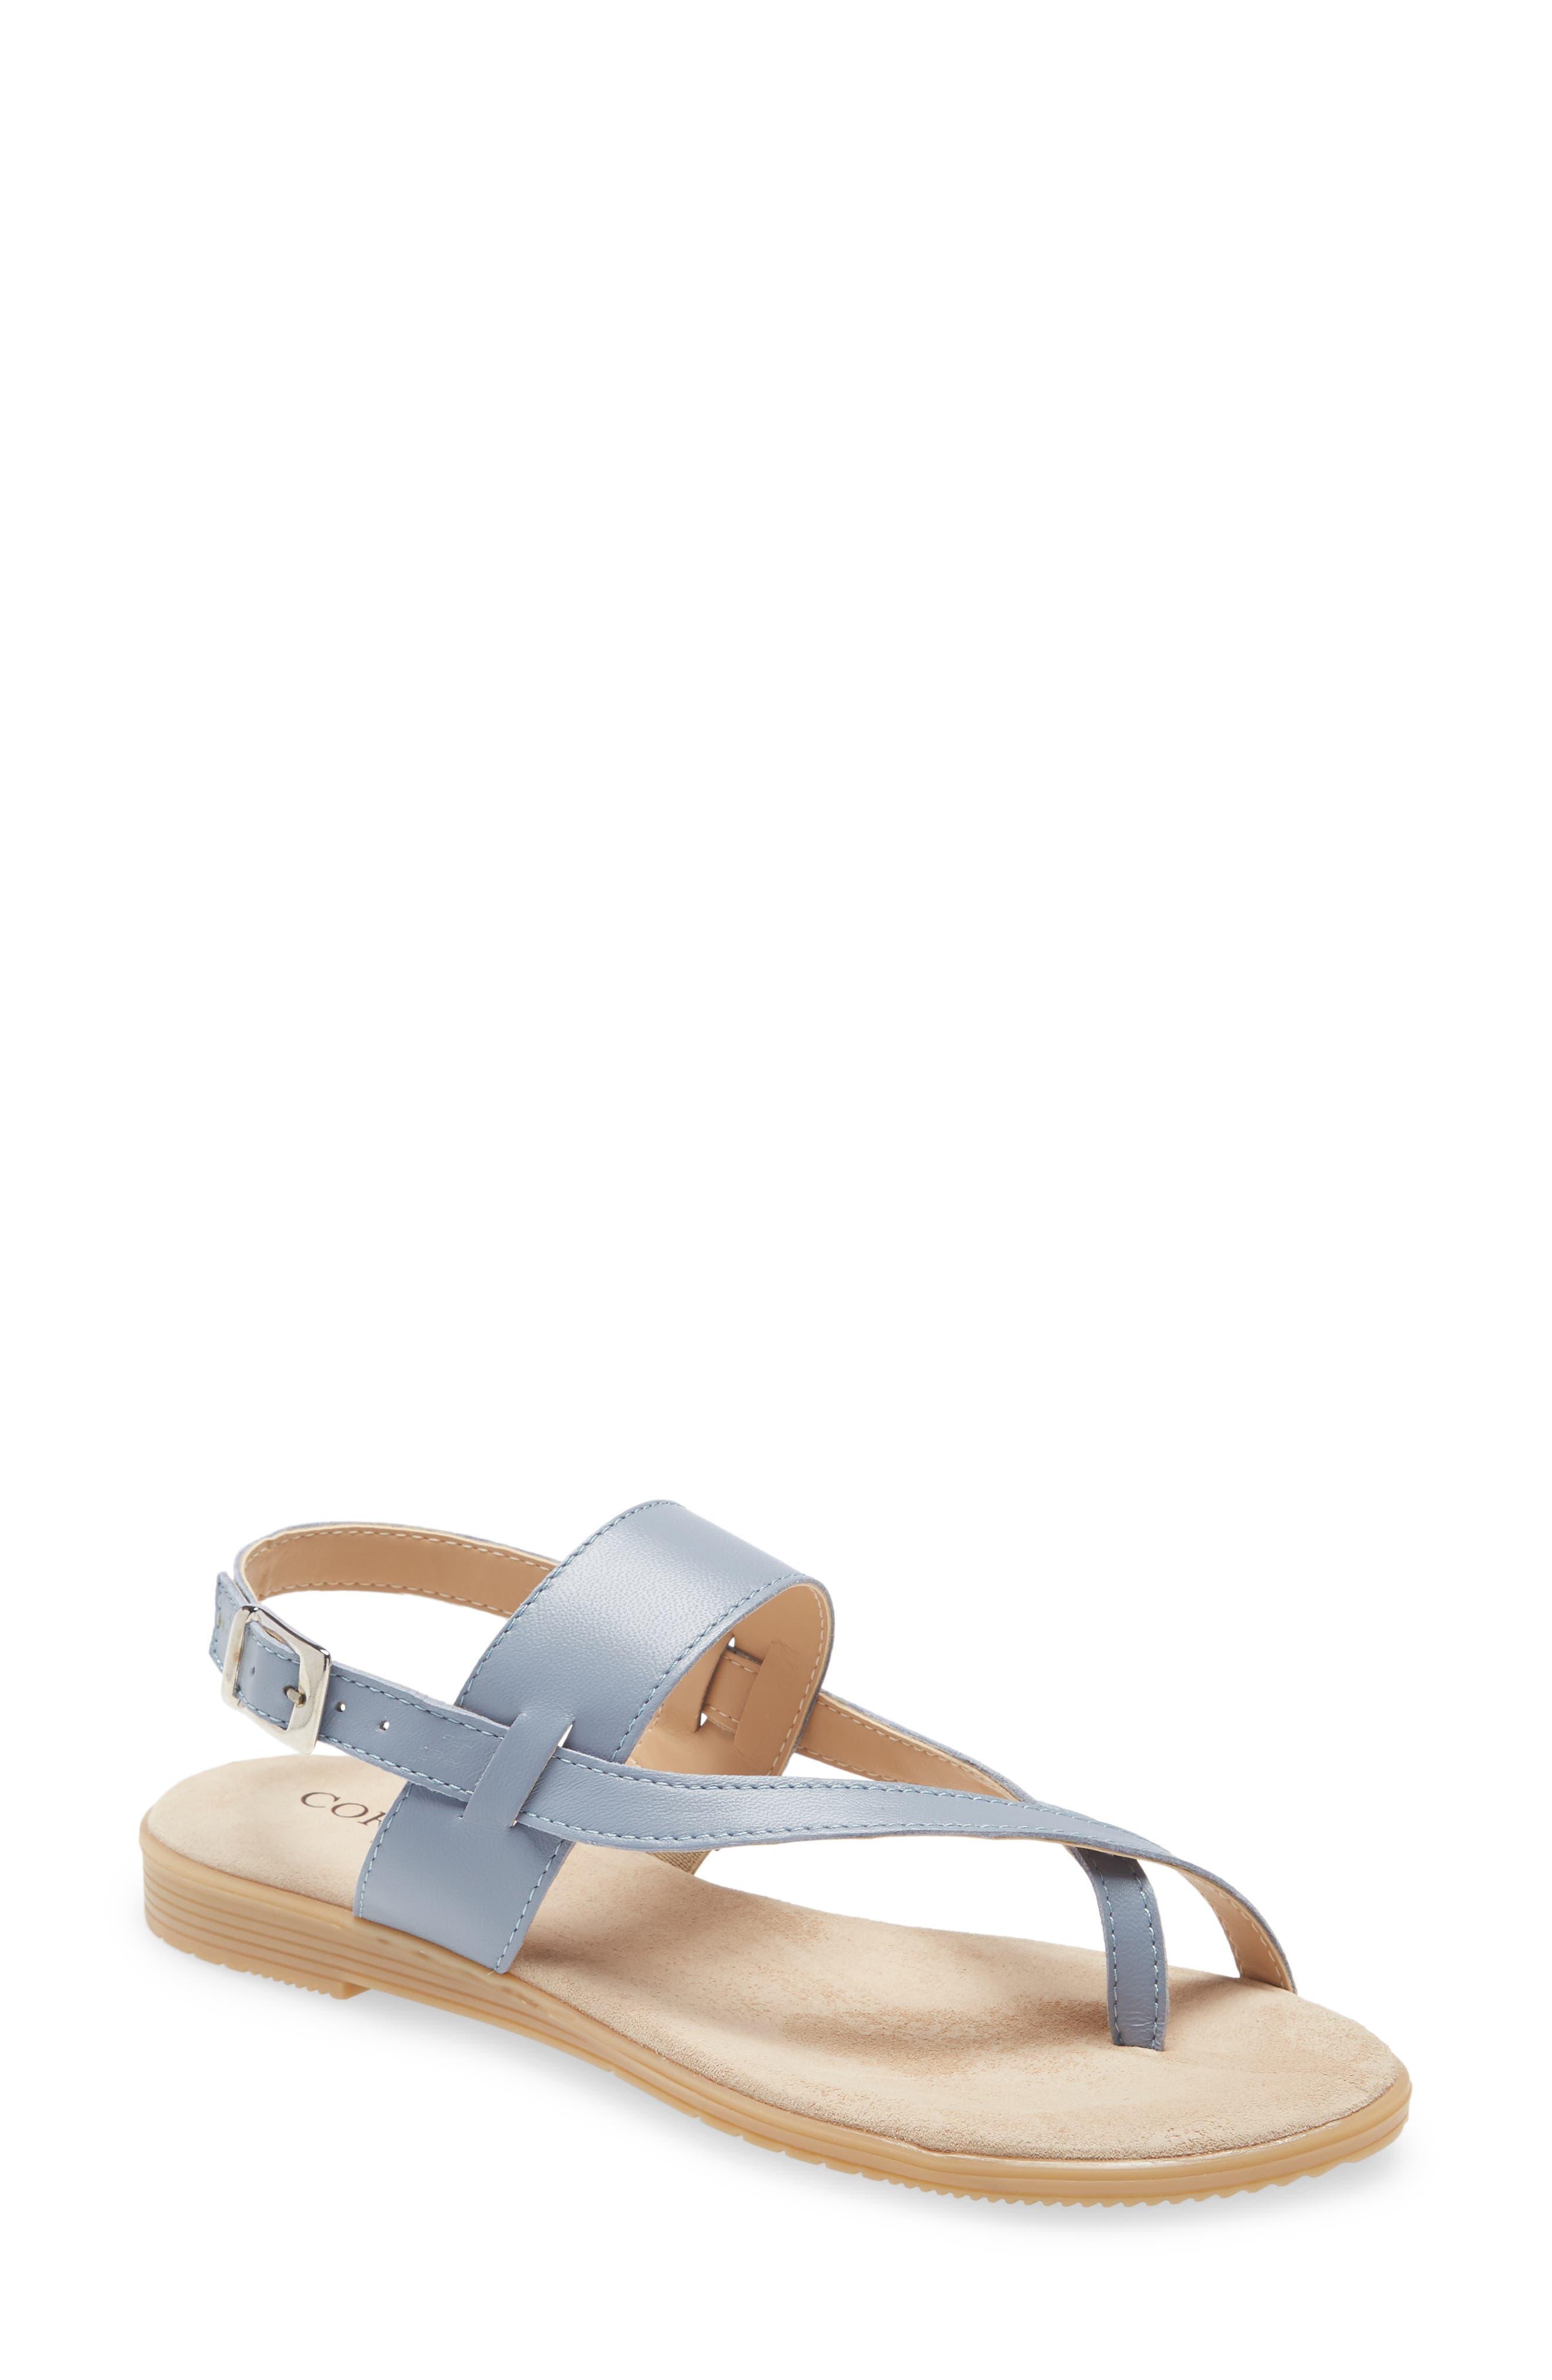 Gretta-B Slingback Sandal